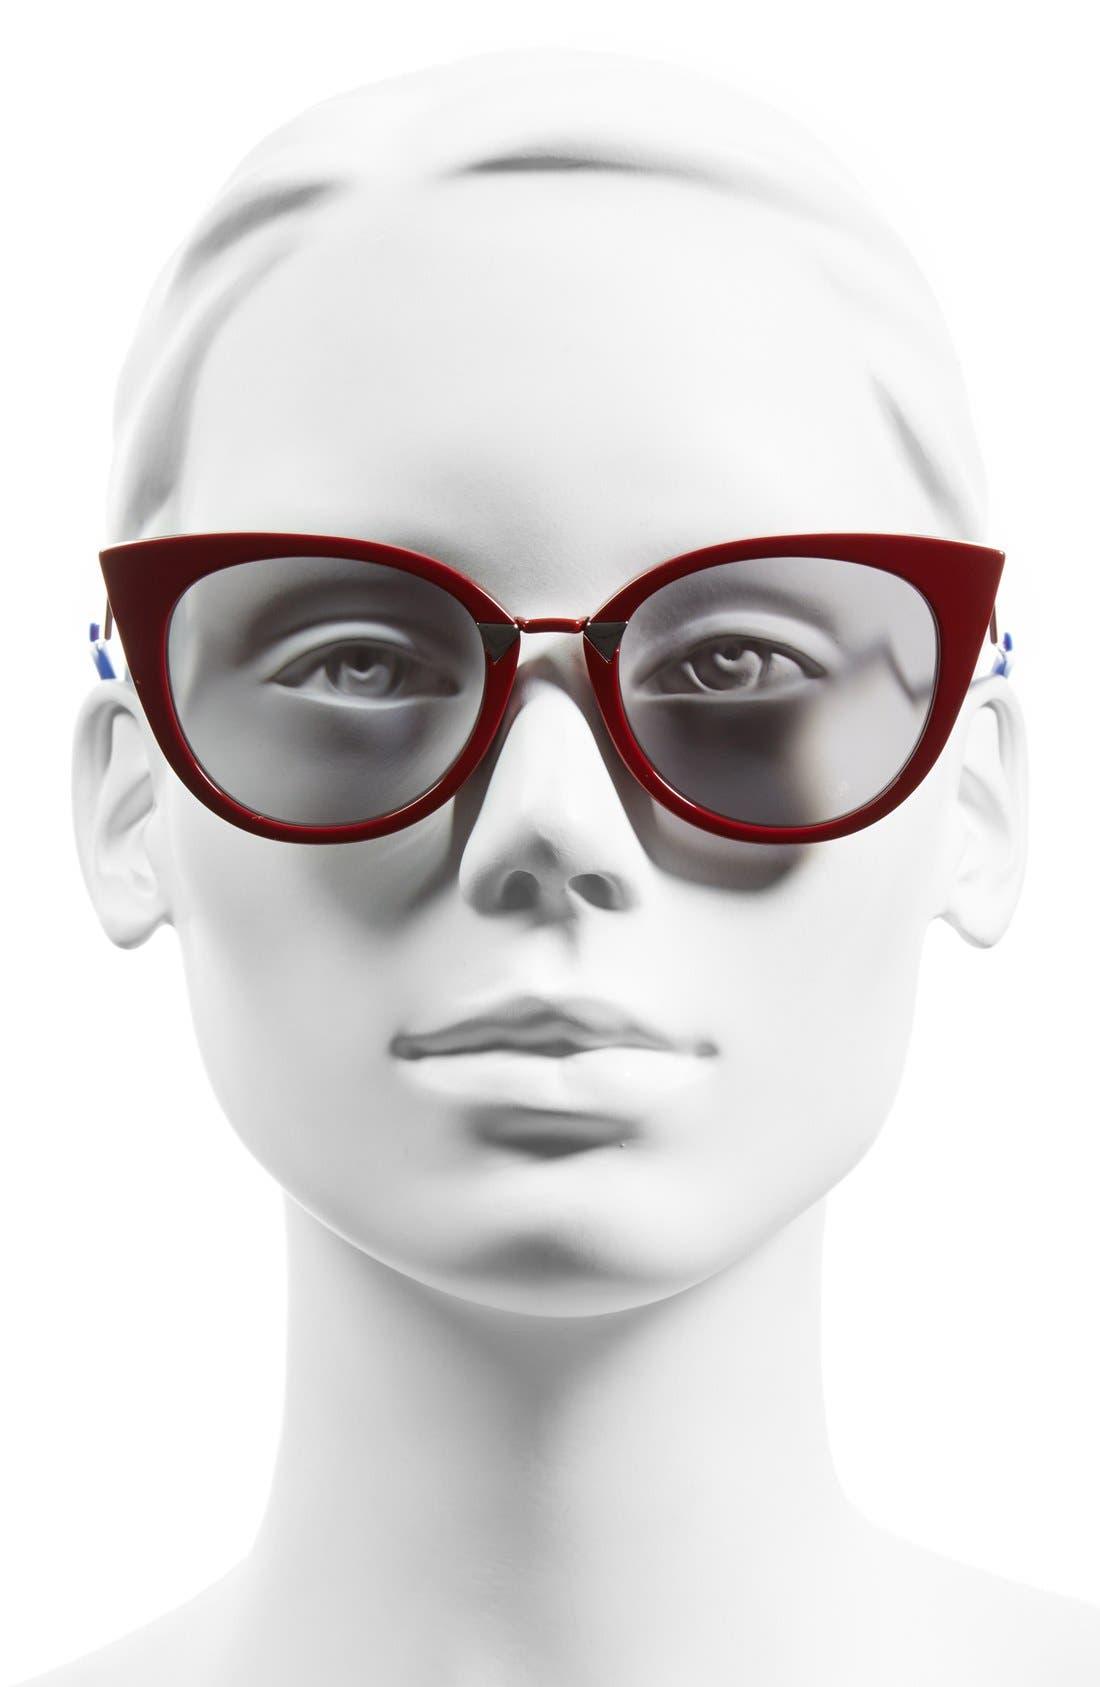 52mm Cat Eye Sunglasses,                             Alternate thumbnail 5, color,